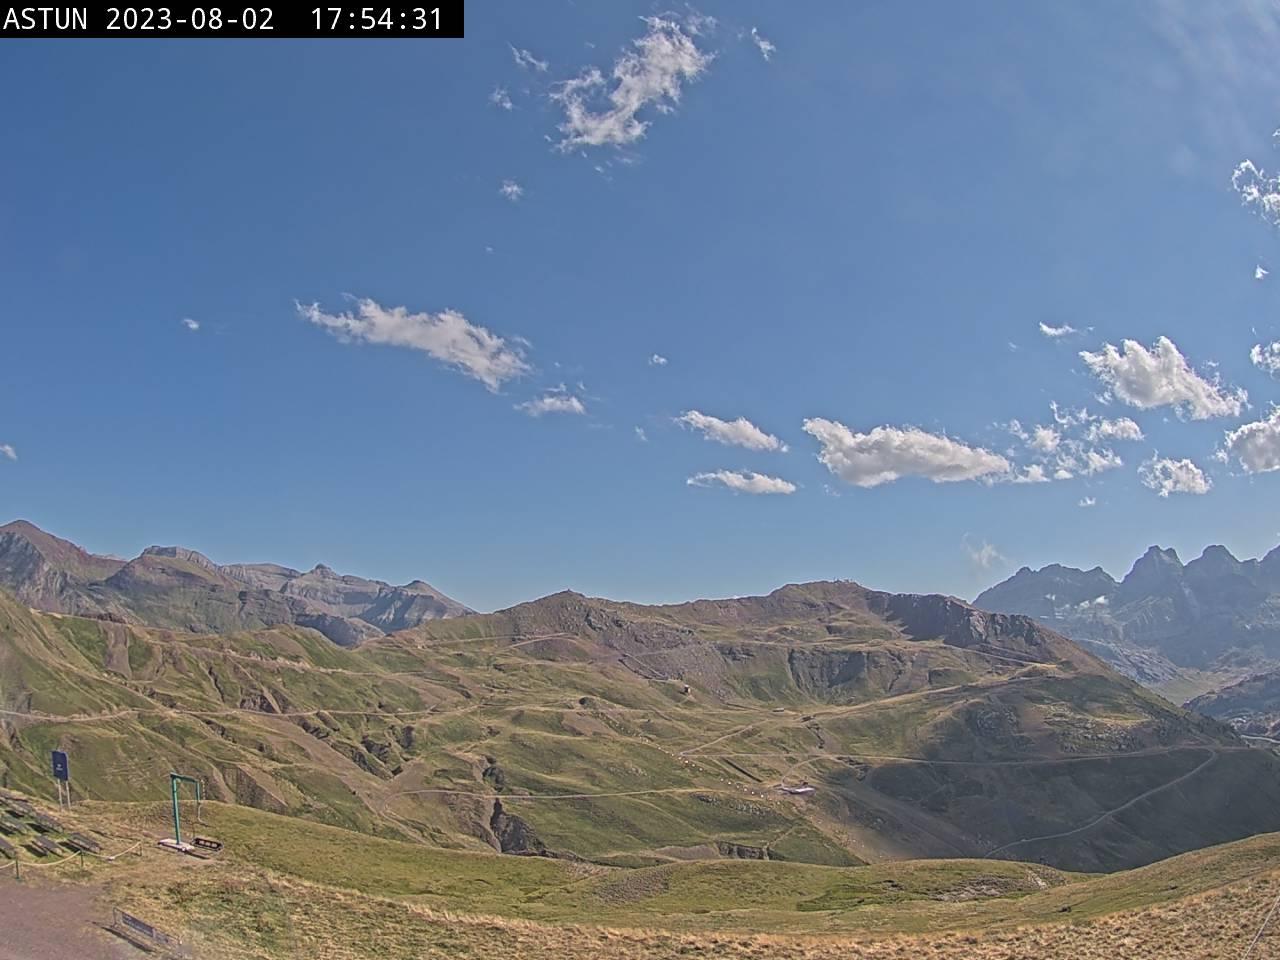 Webcam en Truchas